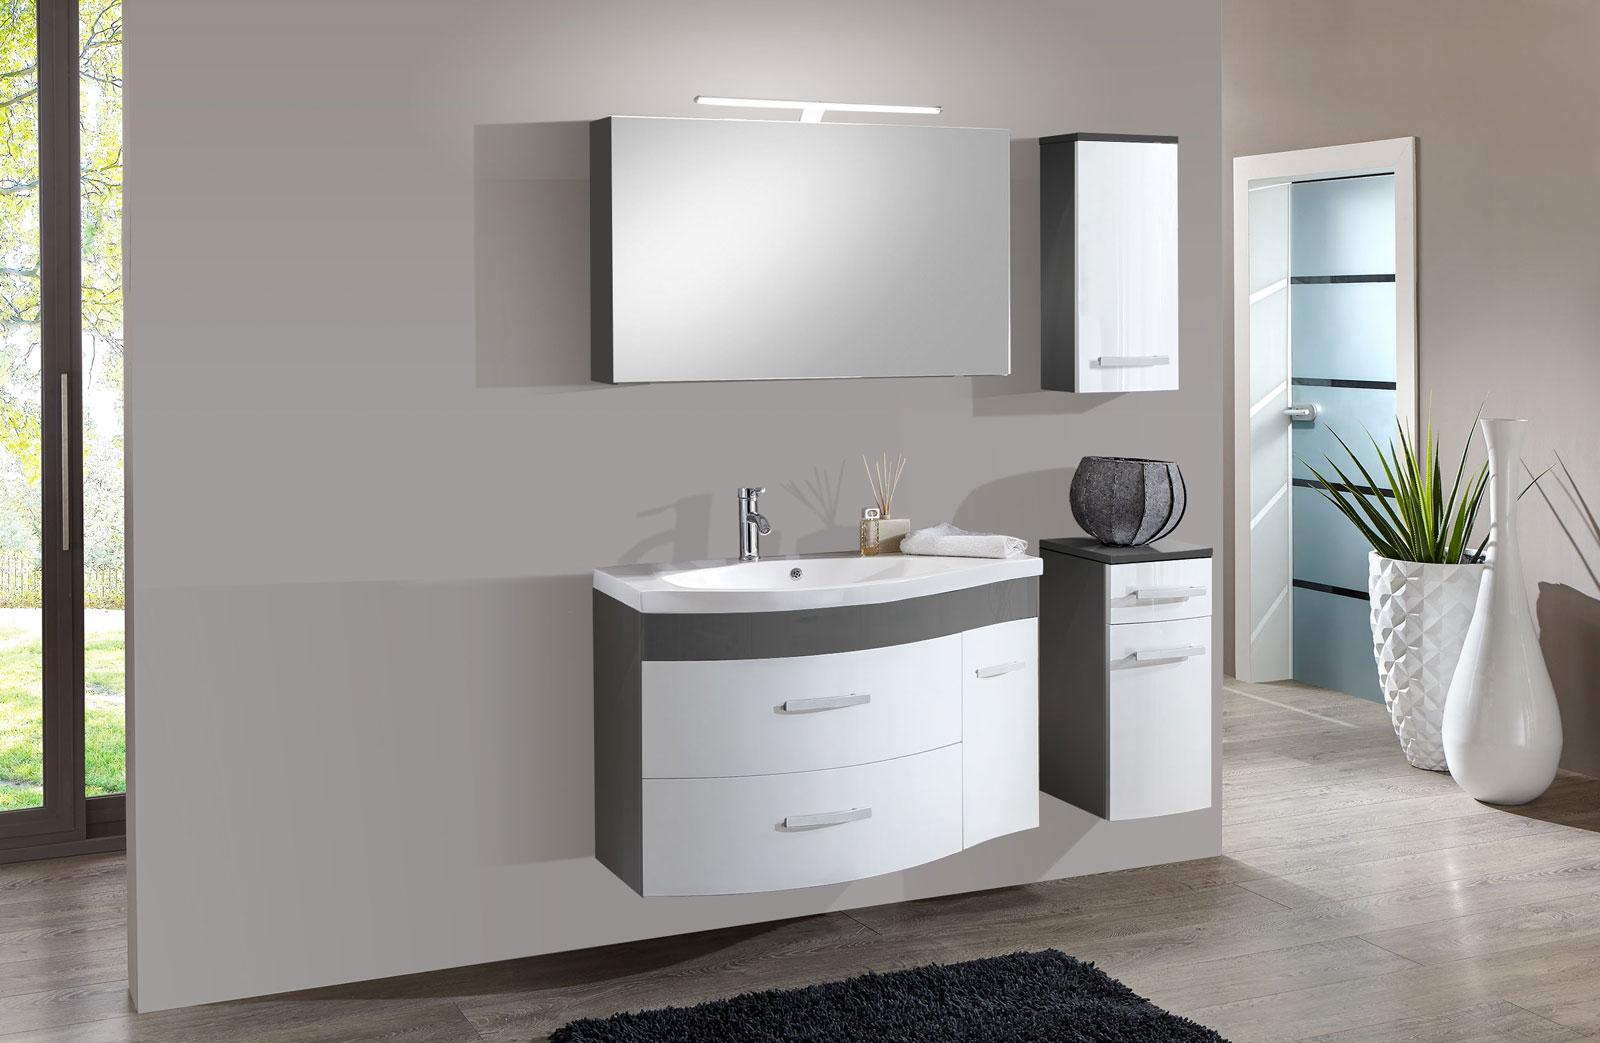 badezimmer grau weiß | jtleigh - hausgestaltung ideen, Hause ideen